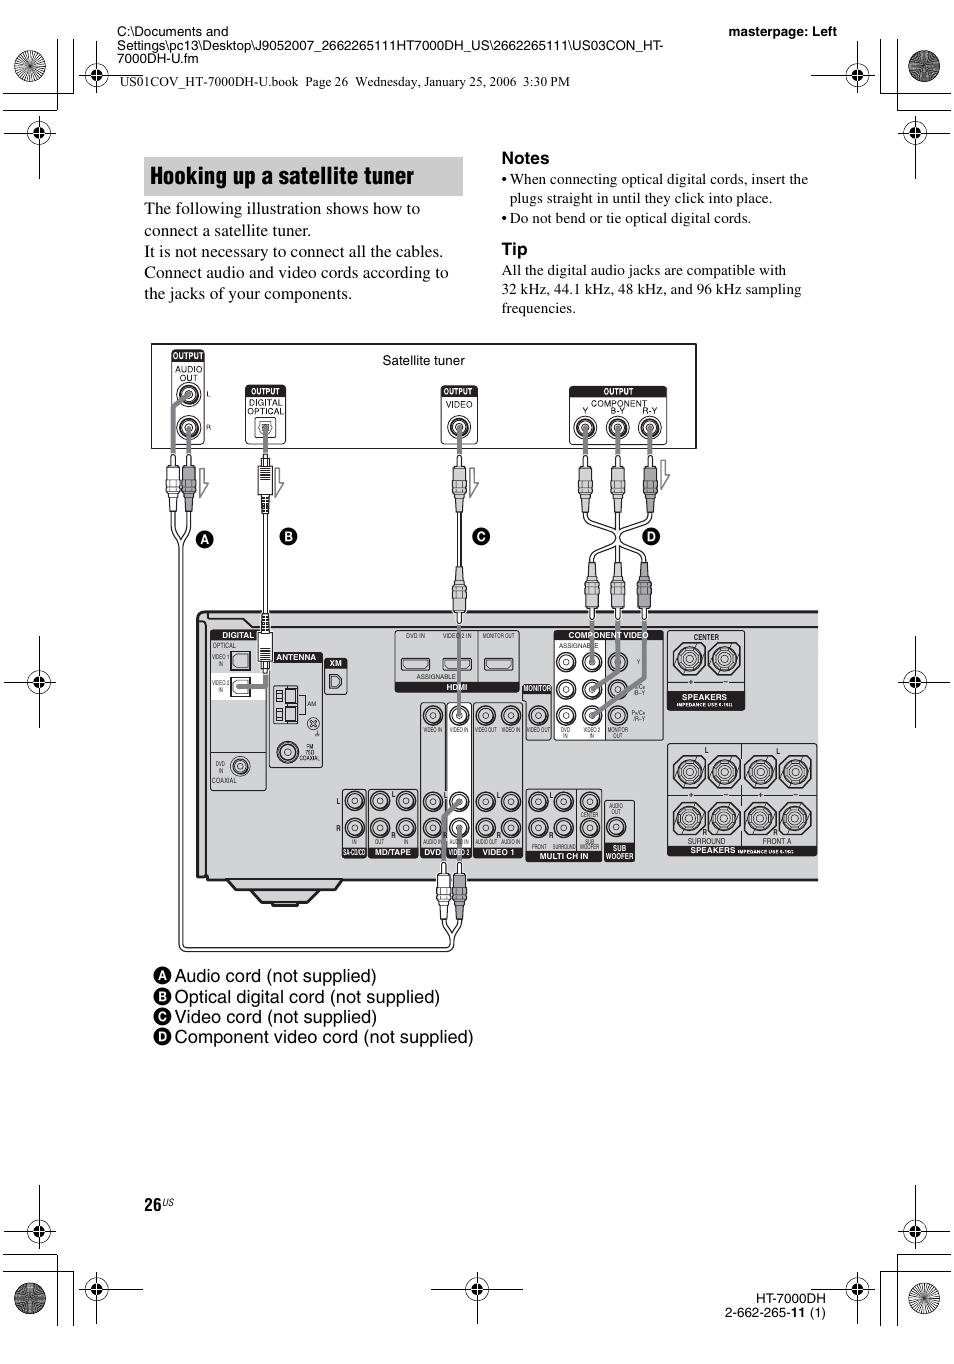 hooking up a satellite tuner satellite tuner sony str k7000 user rh manualsdir com sony str-k7000 specs sony str k700 manual